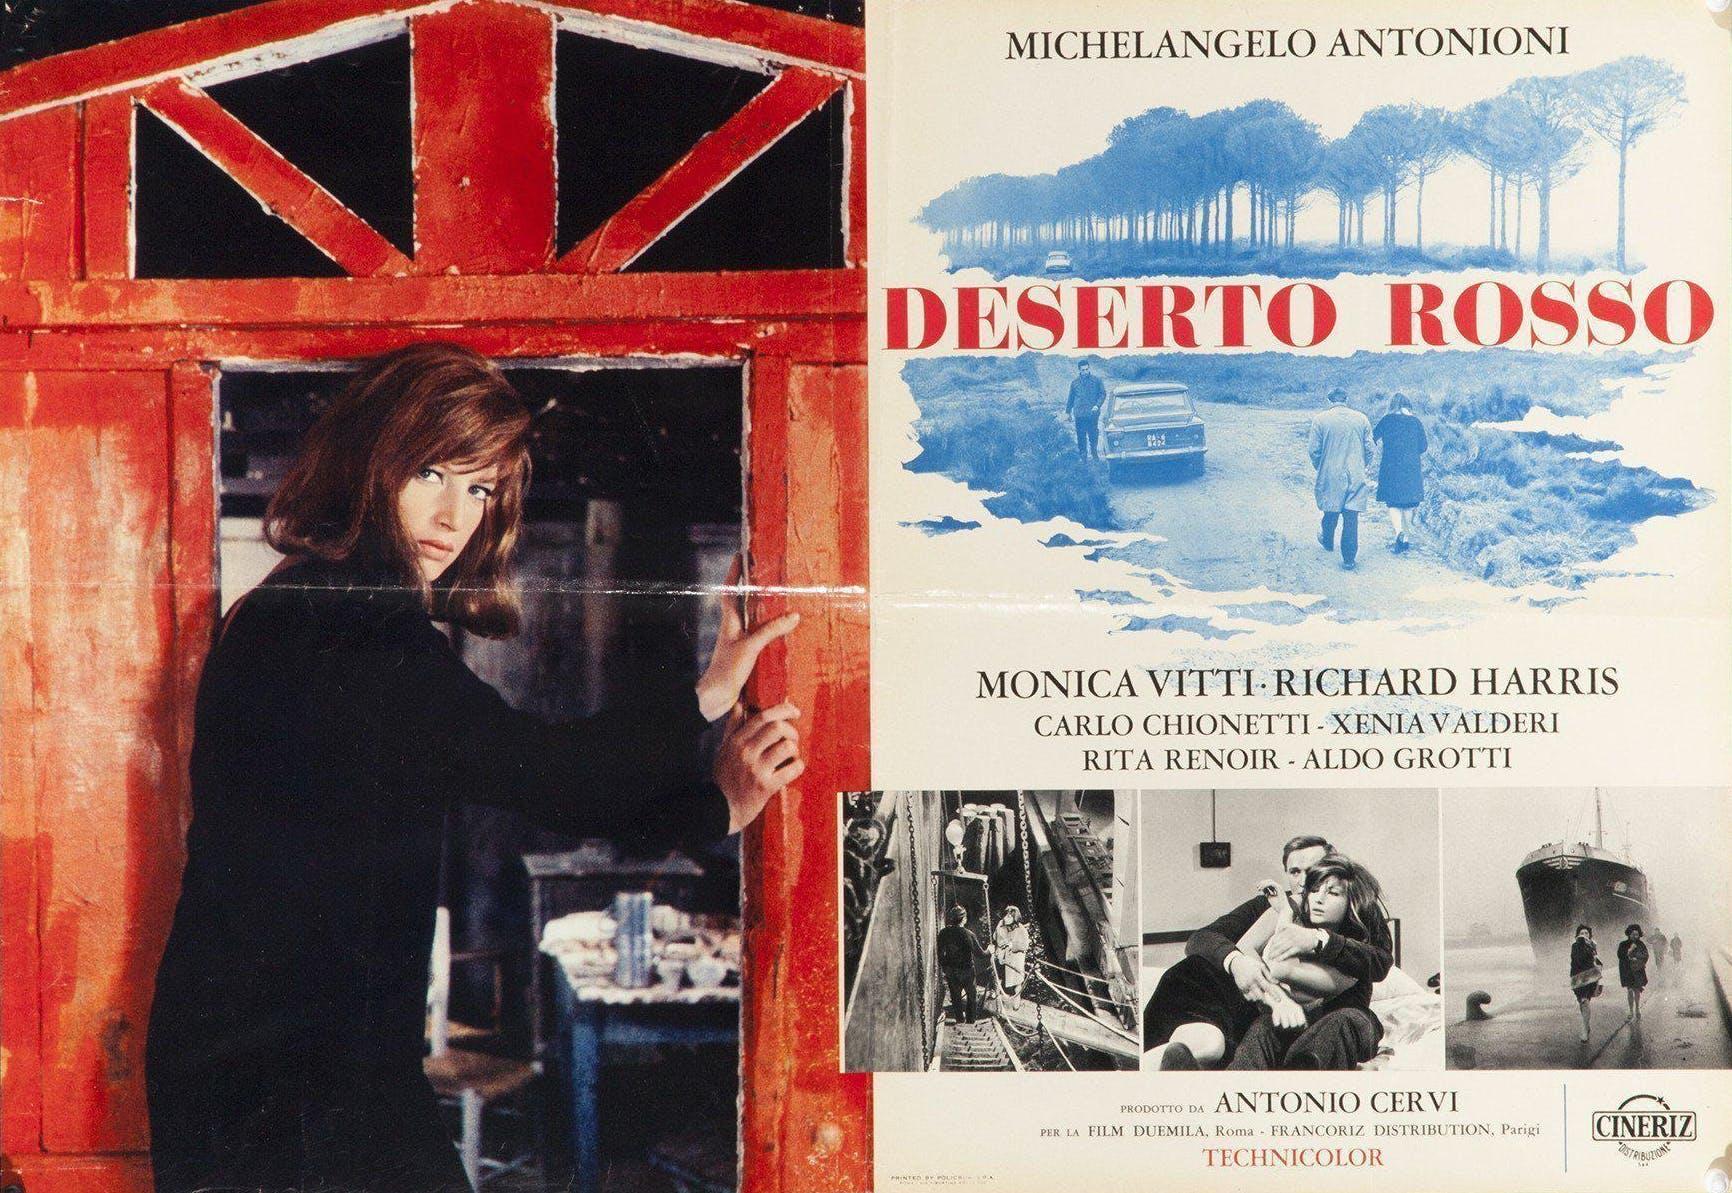 Il Deserto Rosso by Michelangelo Antonioni: Industrial Symphony